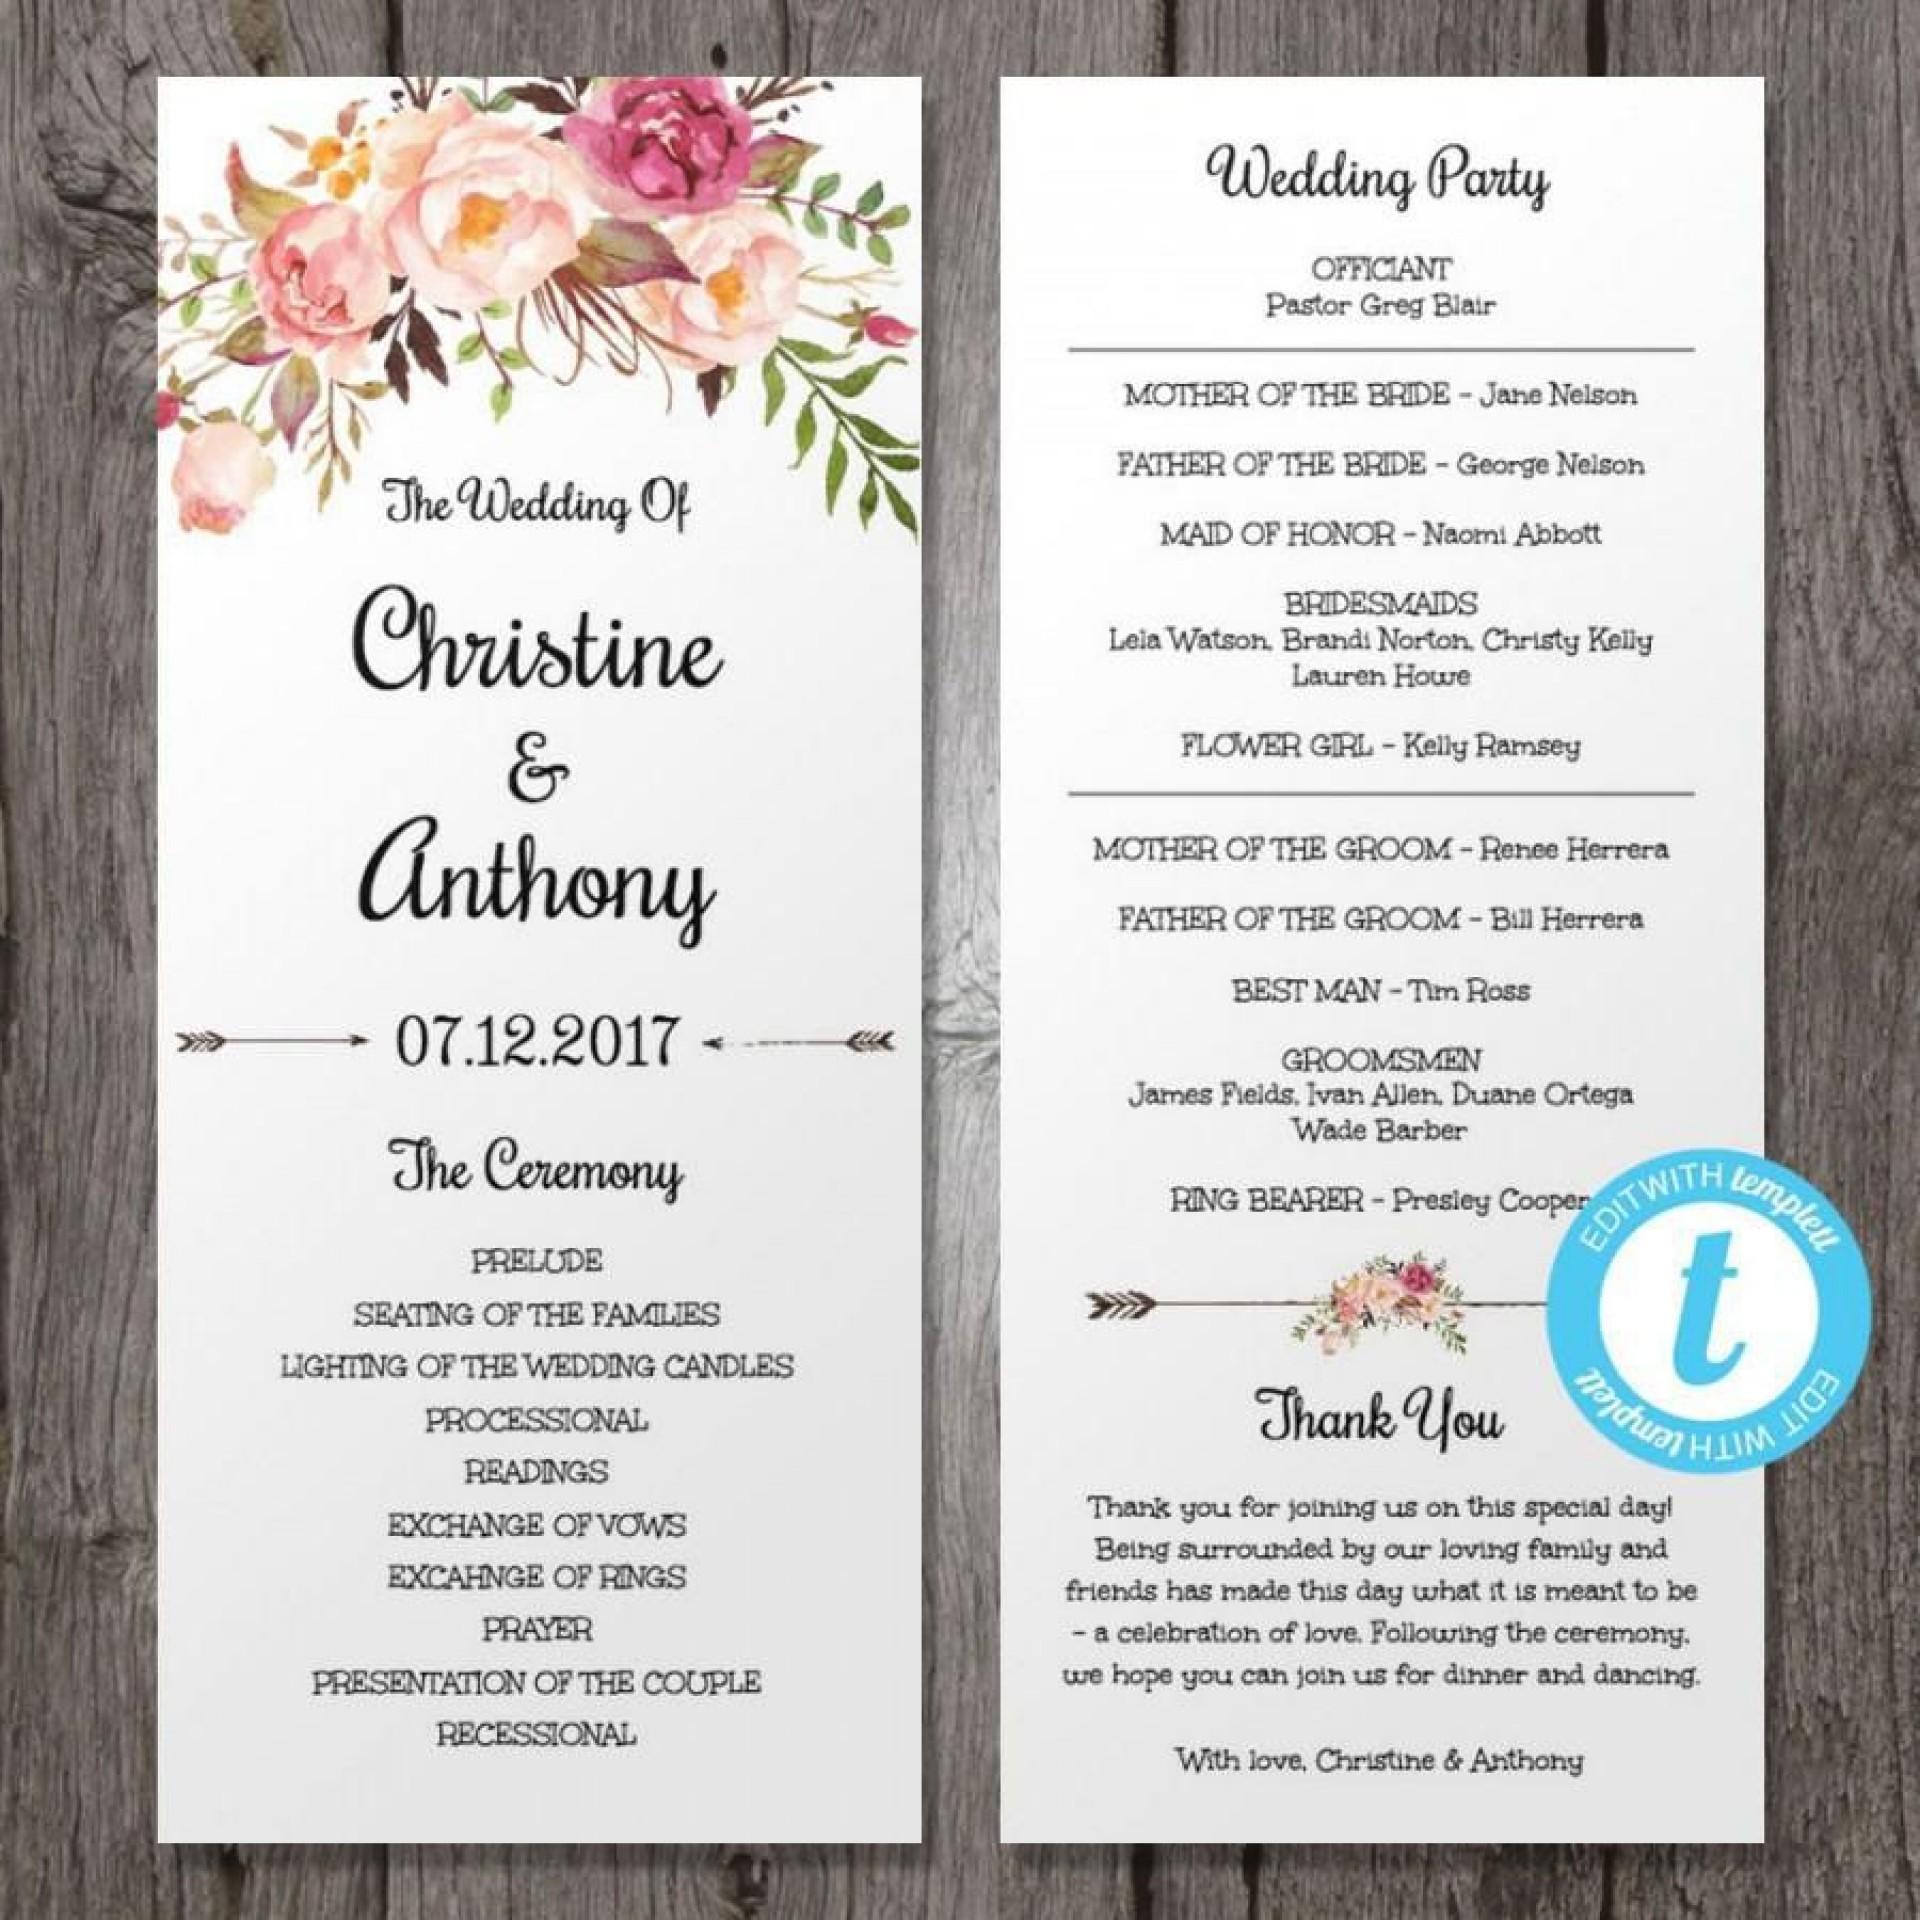 006 Outstanding Wedding Program Template Free Download Picture  Downloadable Pdf Reception Microsoft Word Fan1920